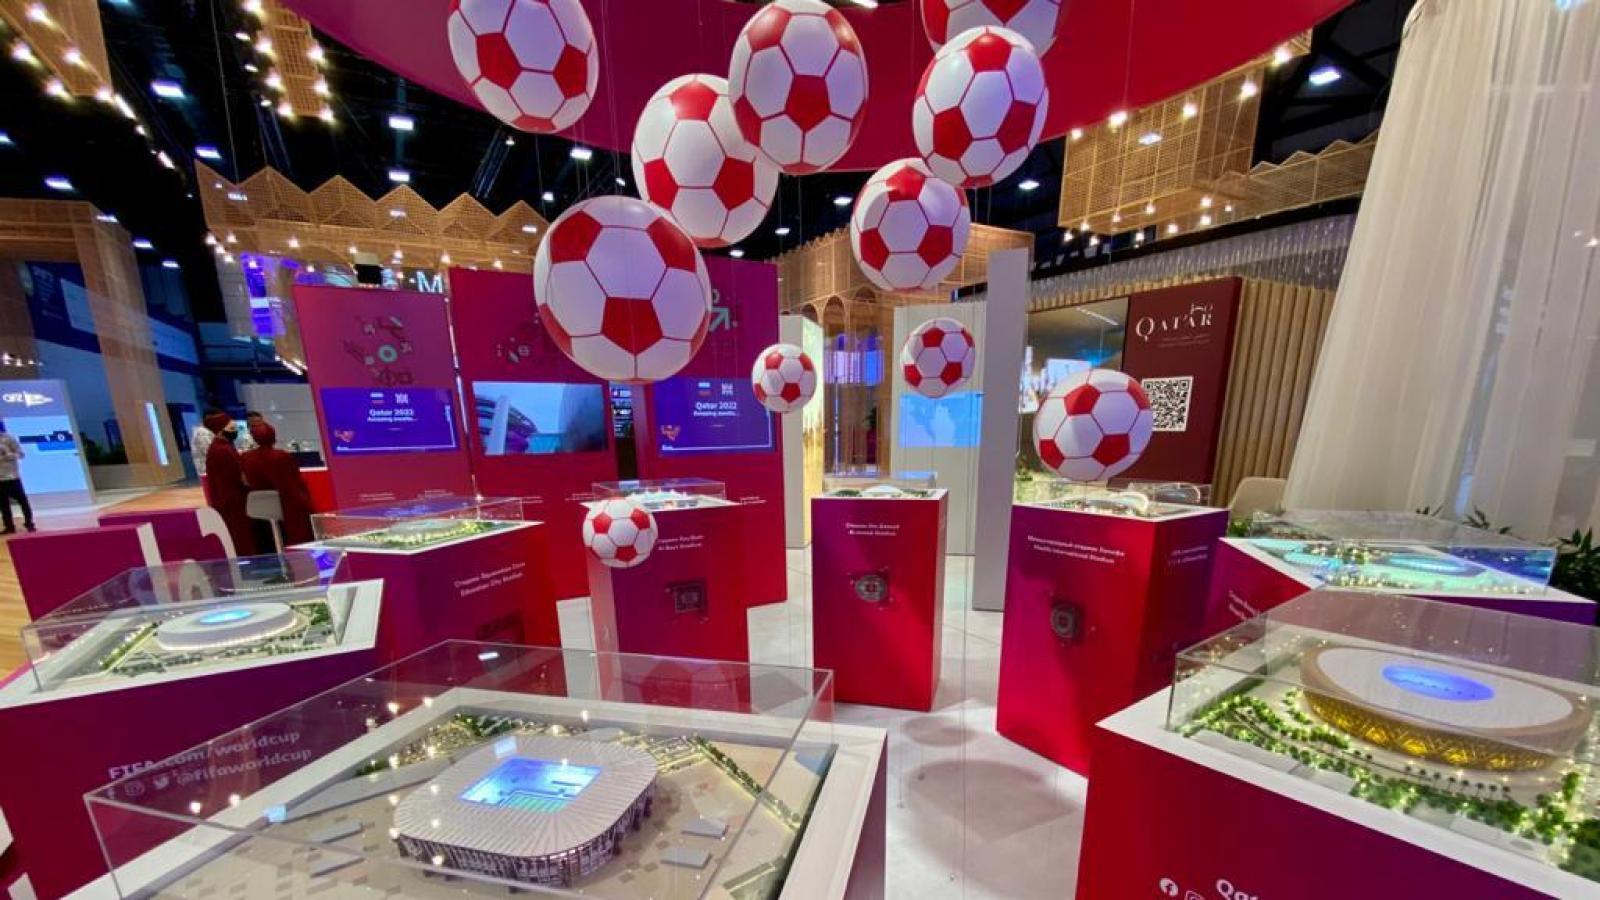 Qatar showcases FIFA World Cup™ preparations during St. Petersburg International Economic Forum